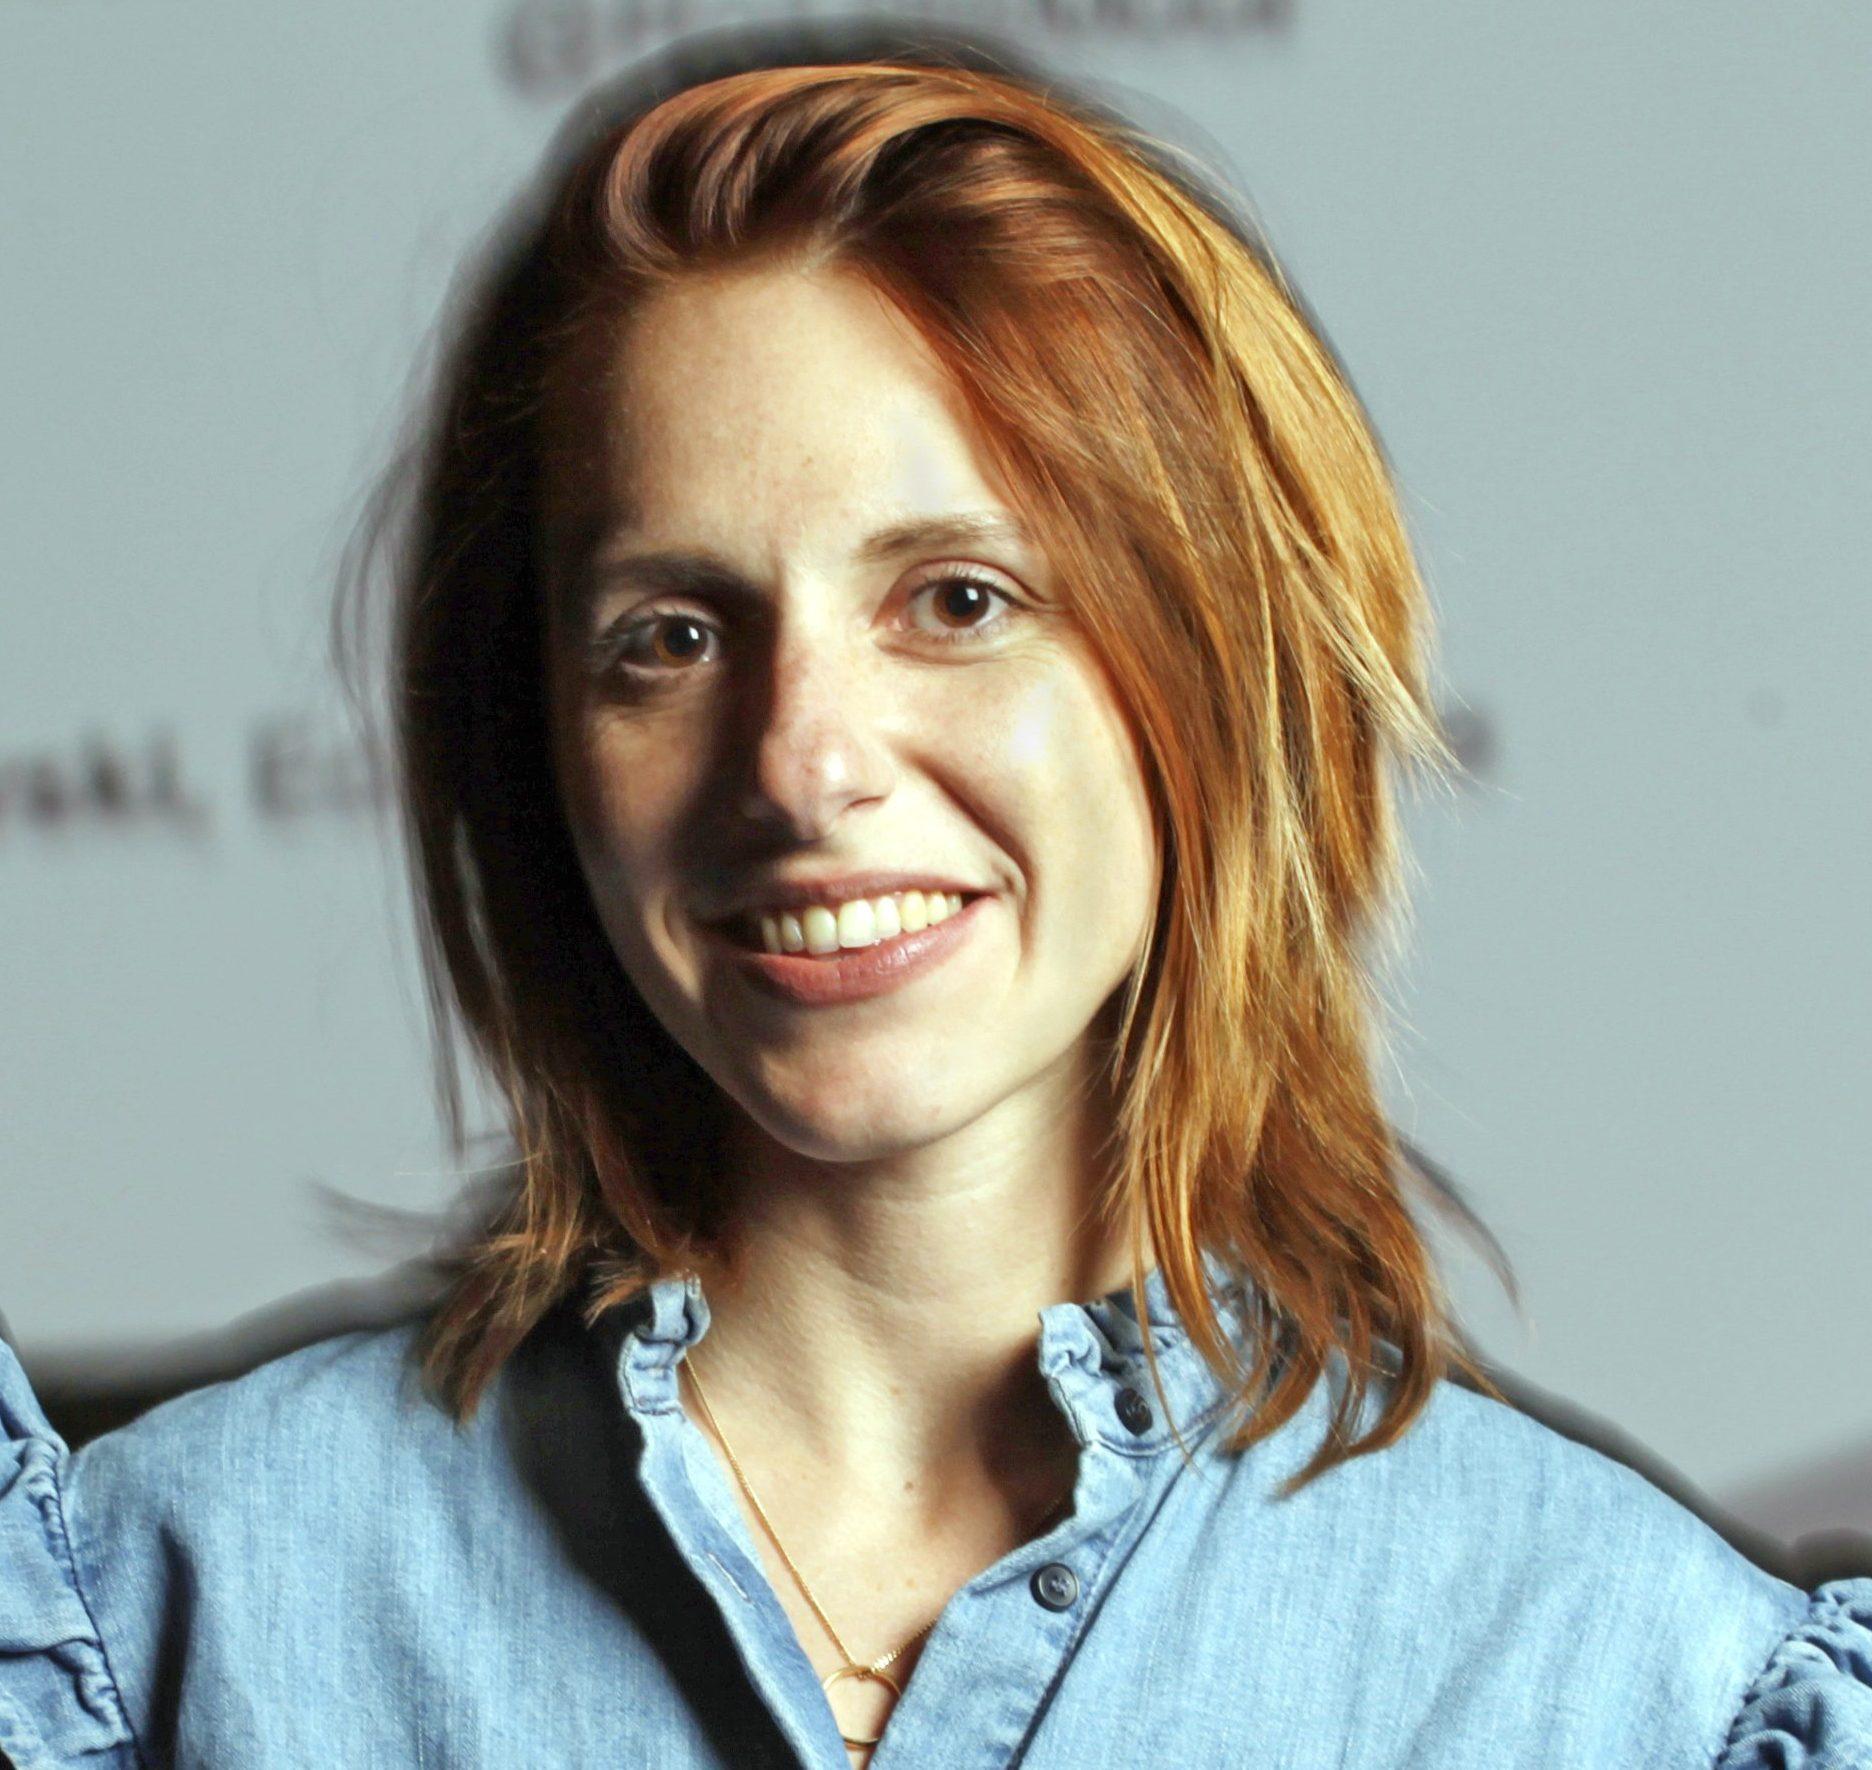 Laura Houlgatte of UNIC